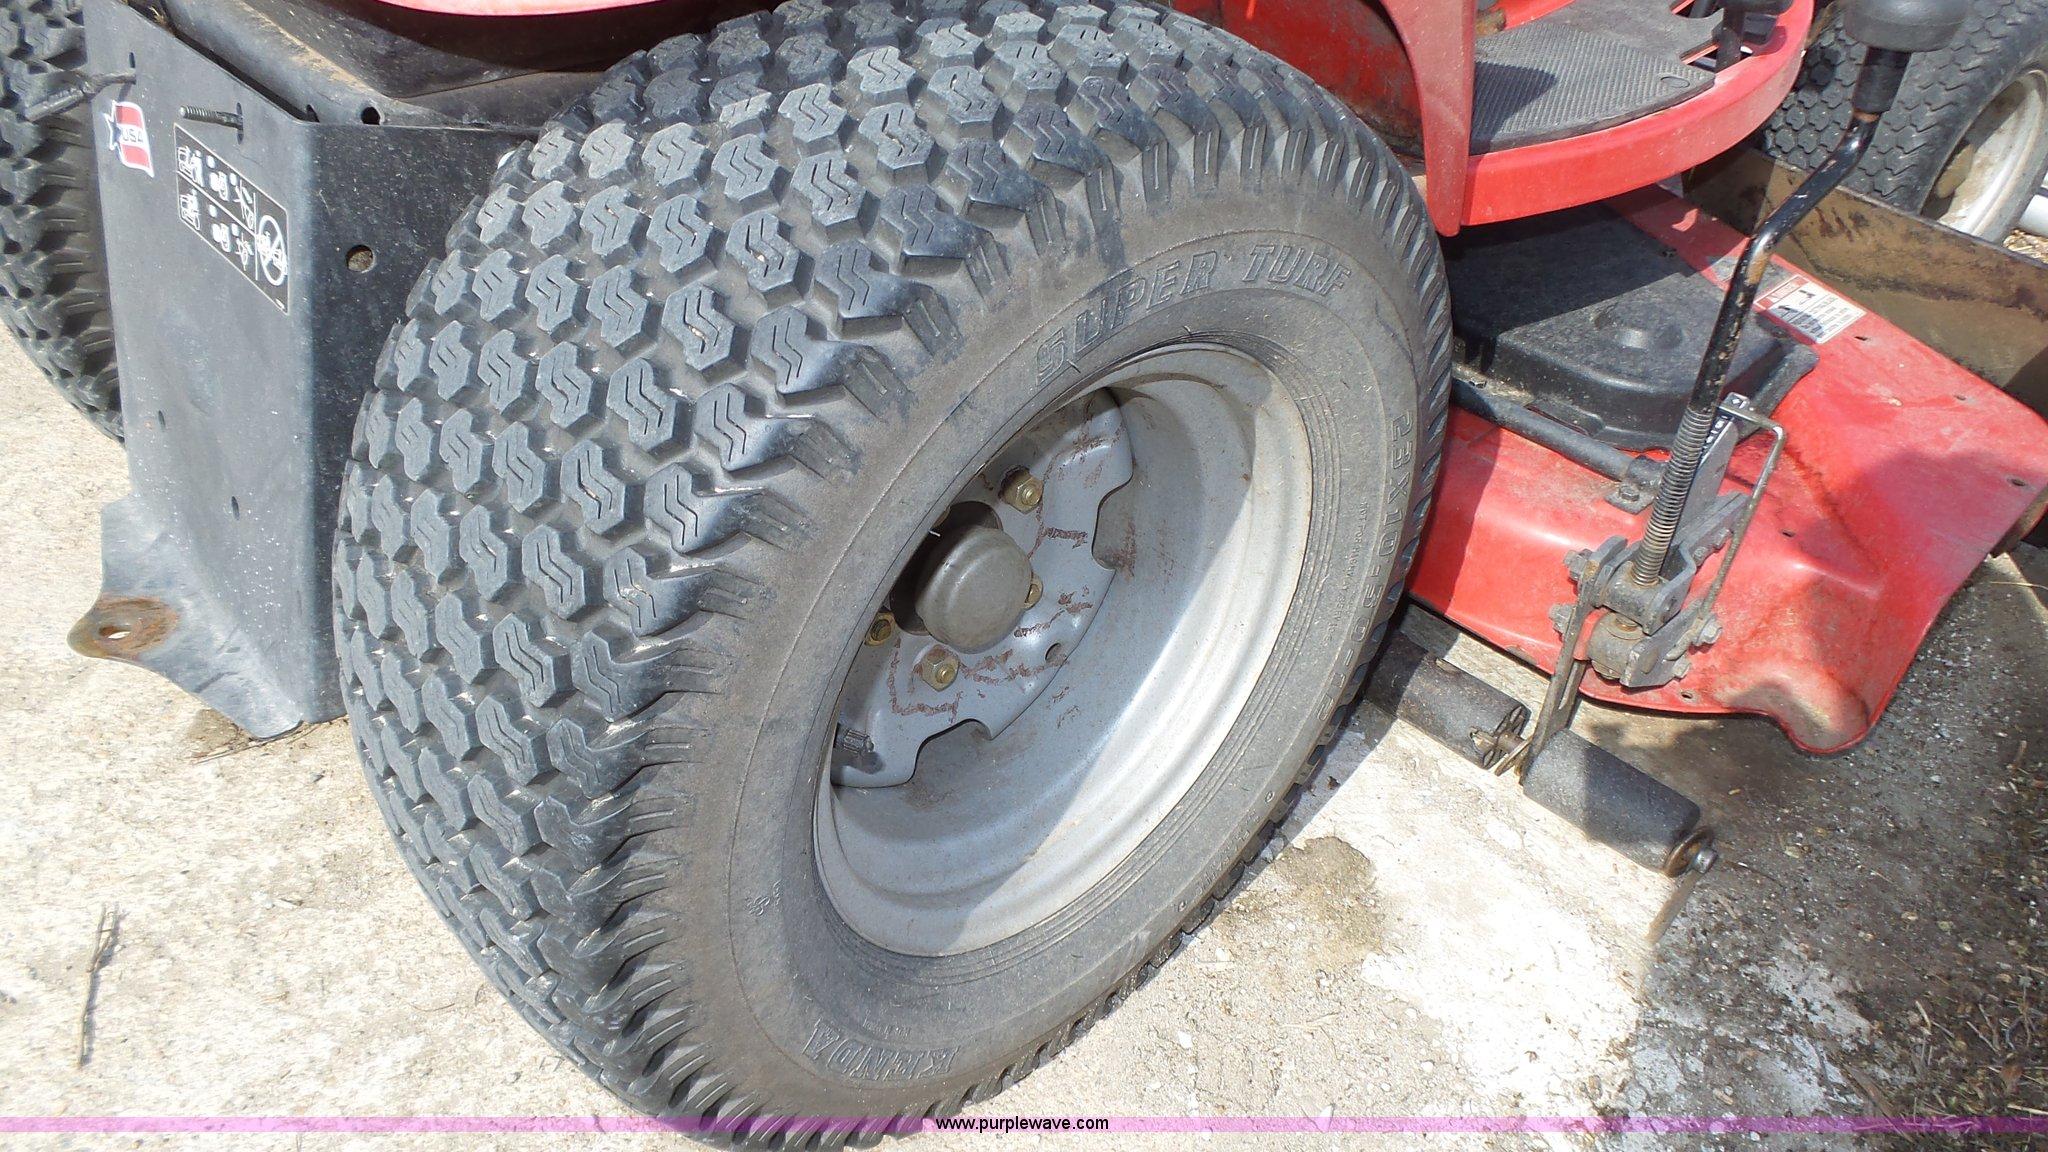 Massey-Ferguson 2722 lawn mower | Item K8274 | SOLD! May 4 V...